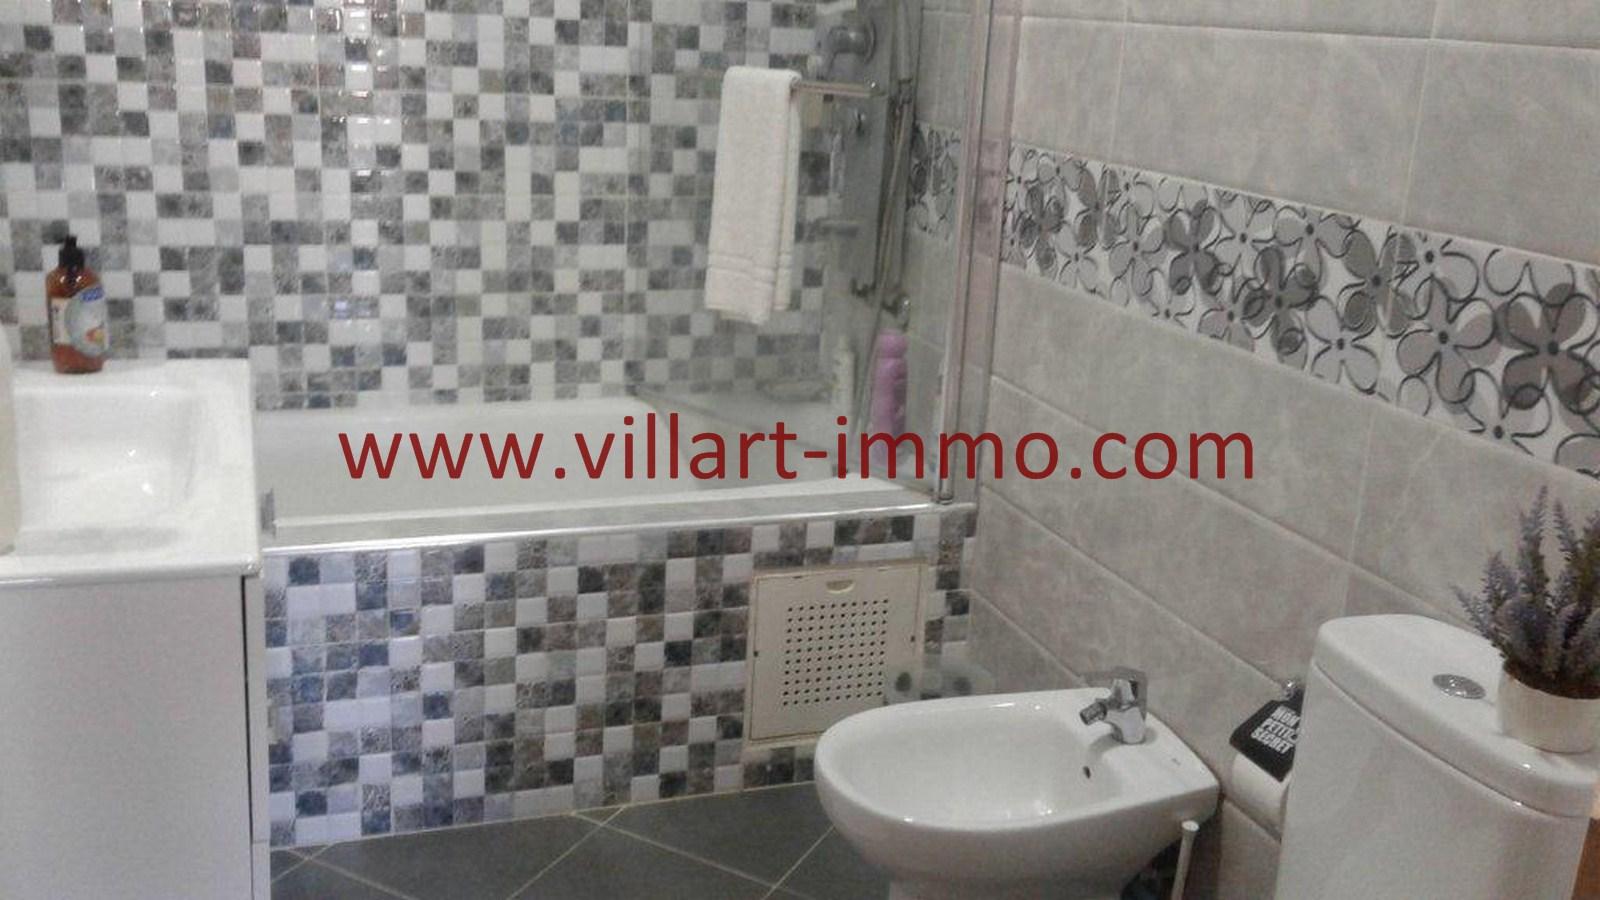 5-A louer-Appartement-Tanger-Castilla-Salle-De-Bain-L1040-Villart immo-Agence Immobilière